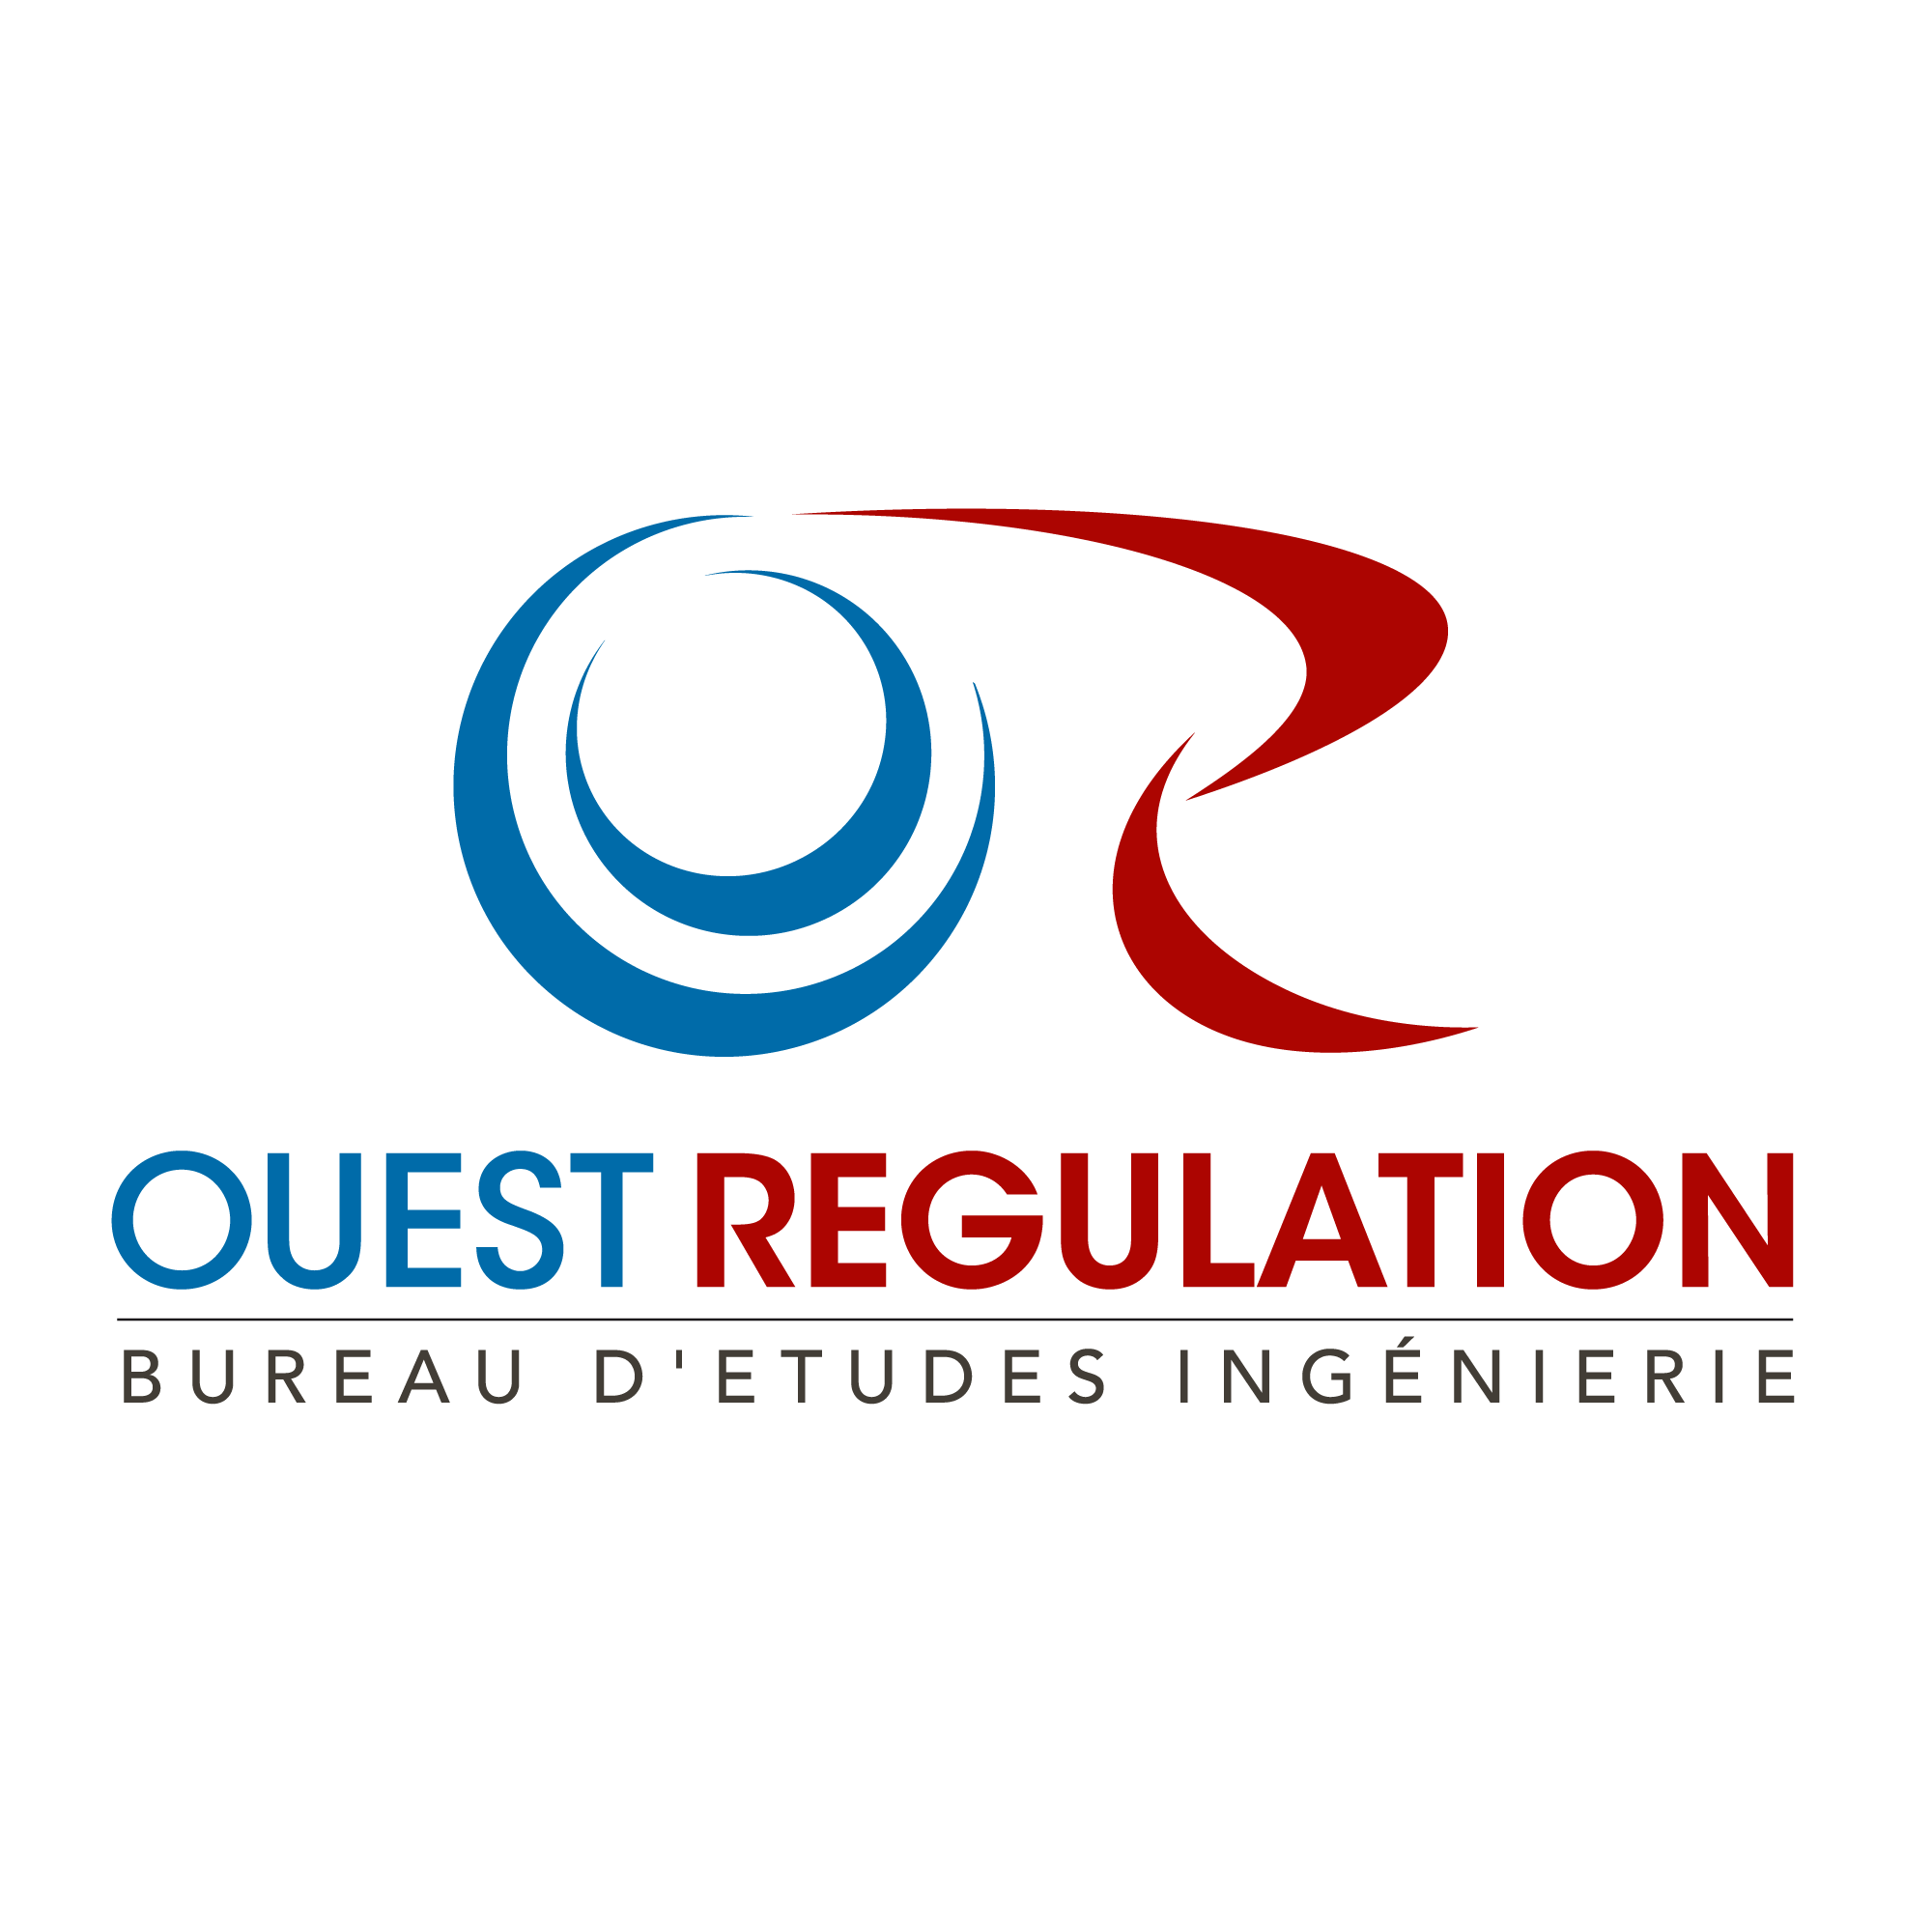 Ouest Regulation